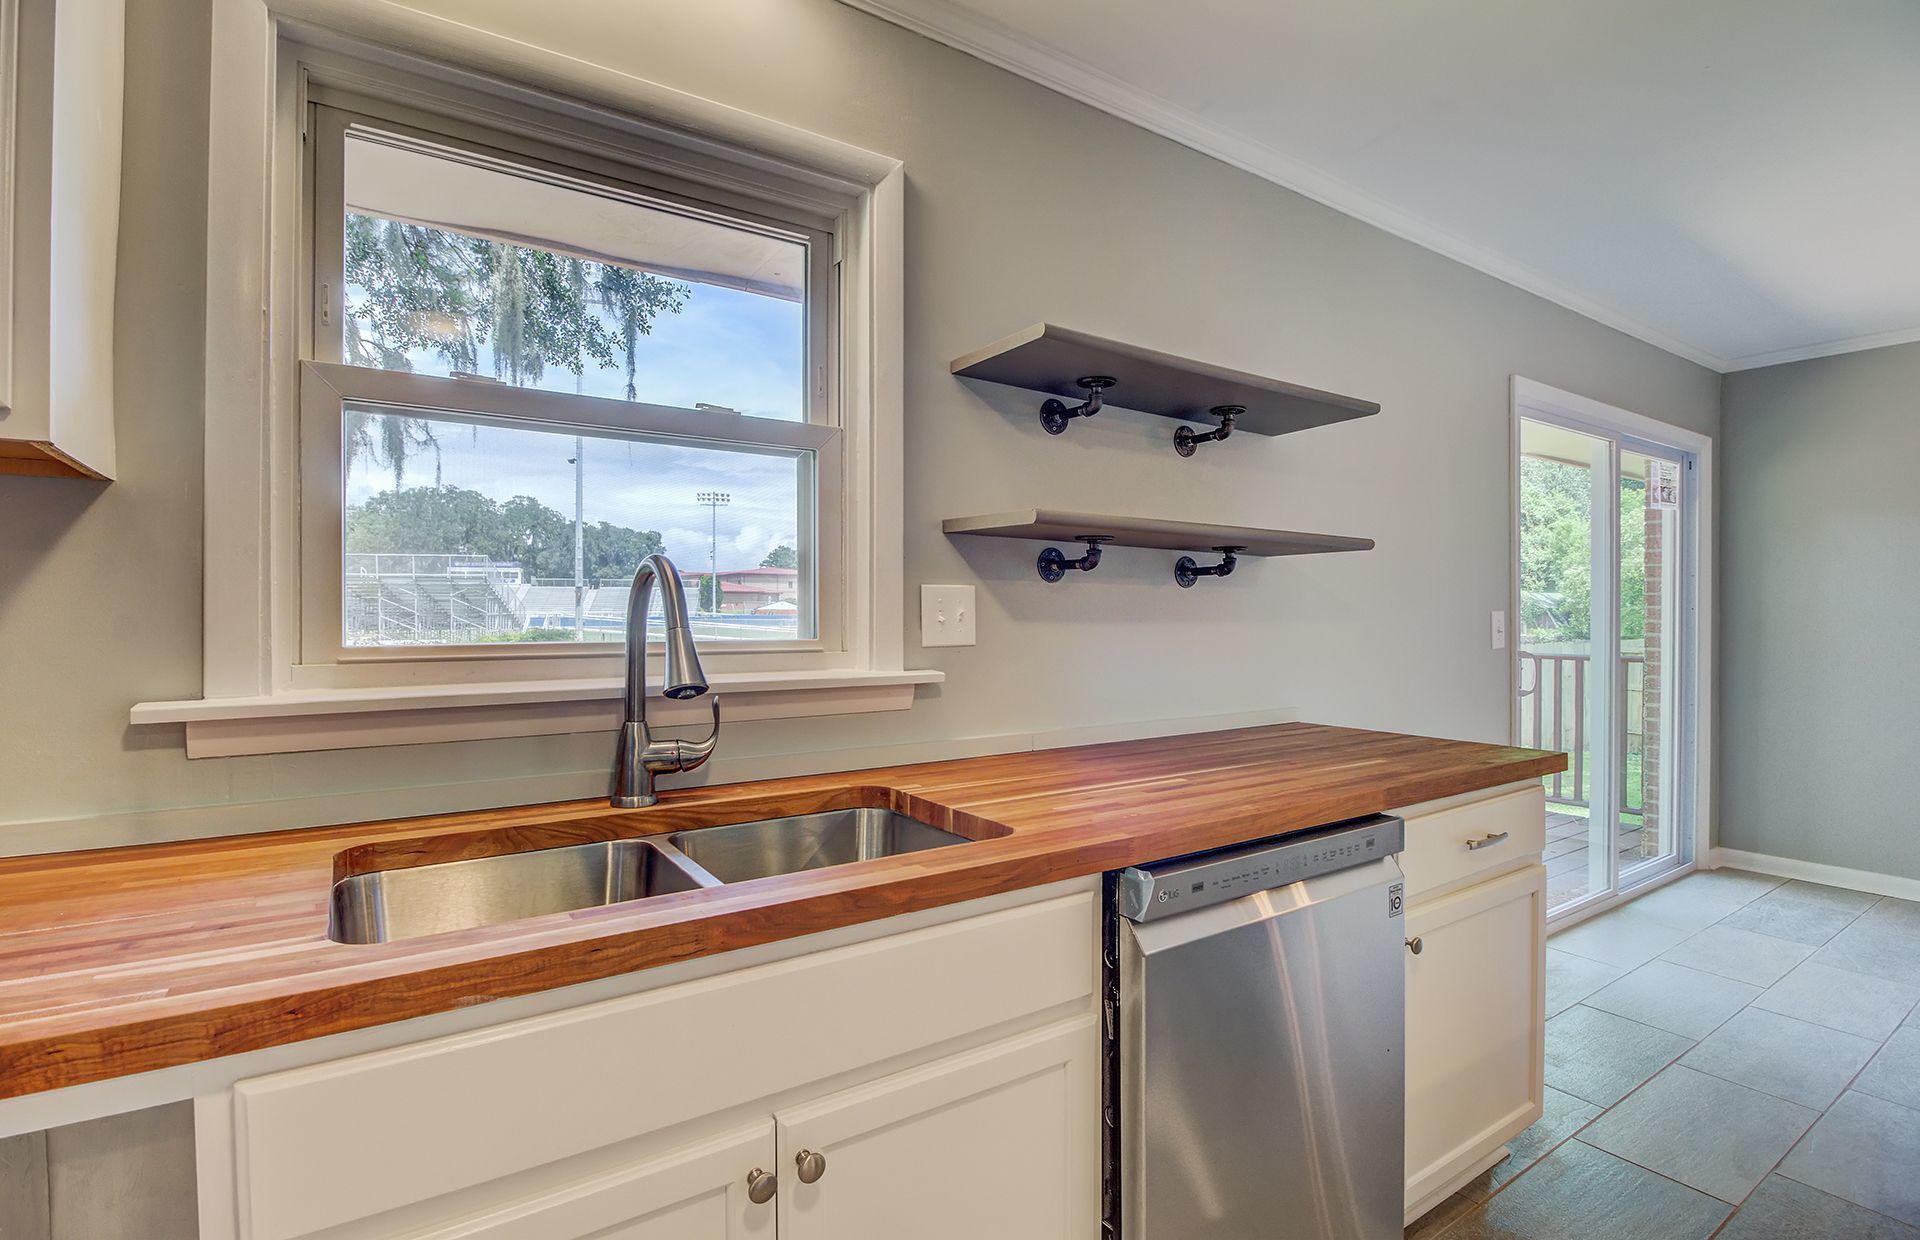 Belvedere Estates Homes For Sale - 6010 Ridgecrest, Hanahan, SC - 4